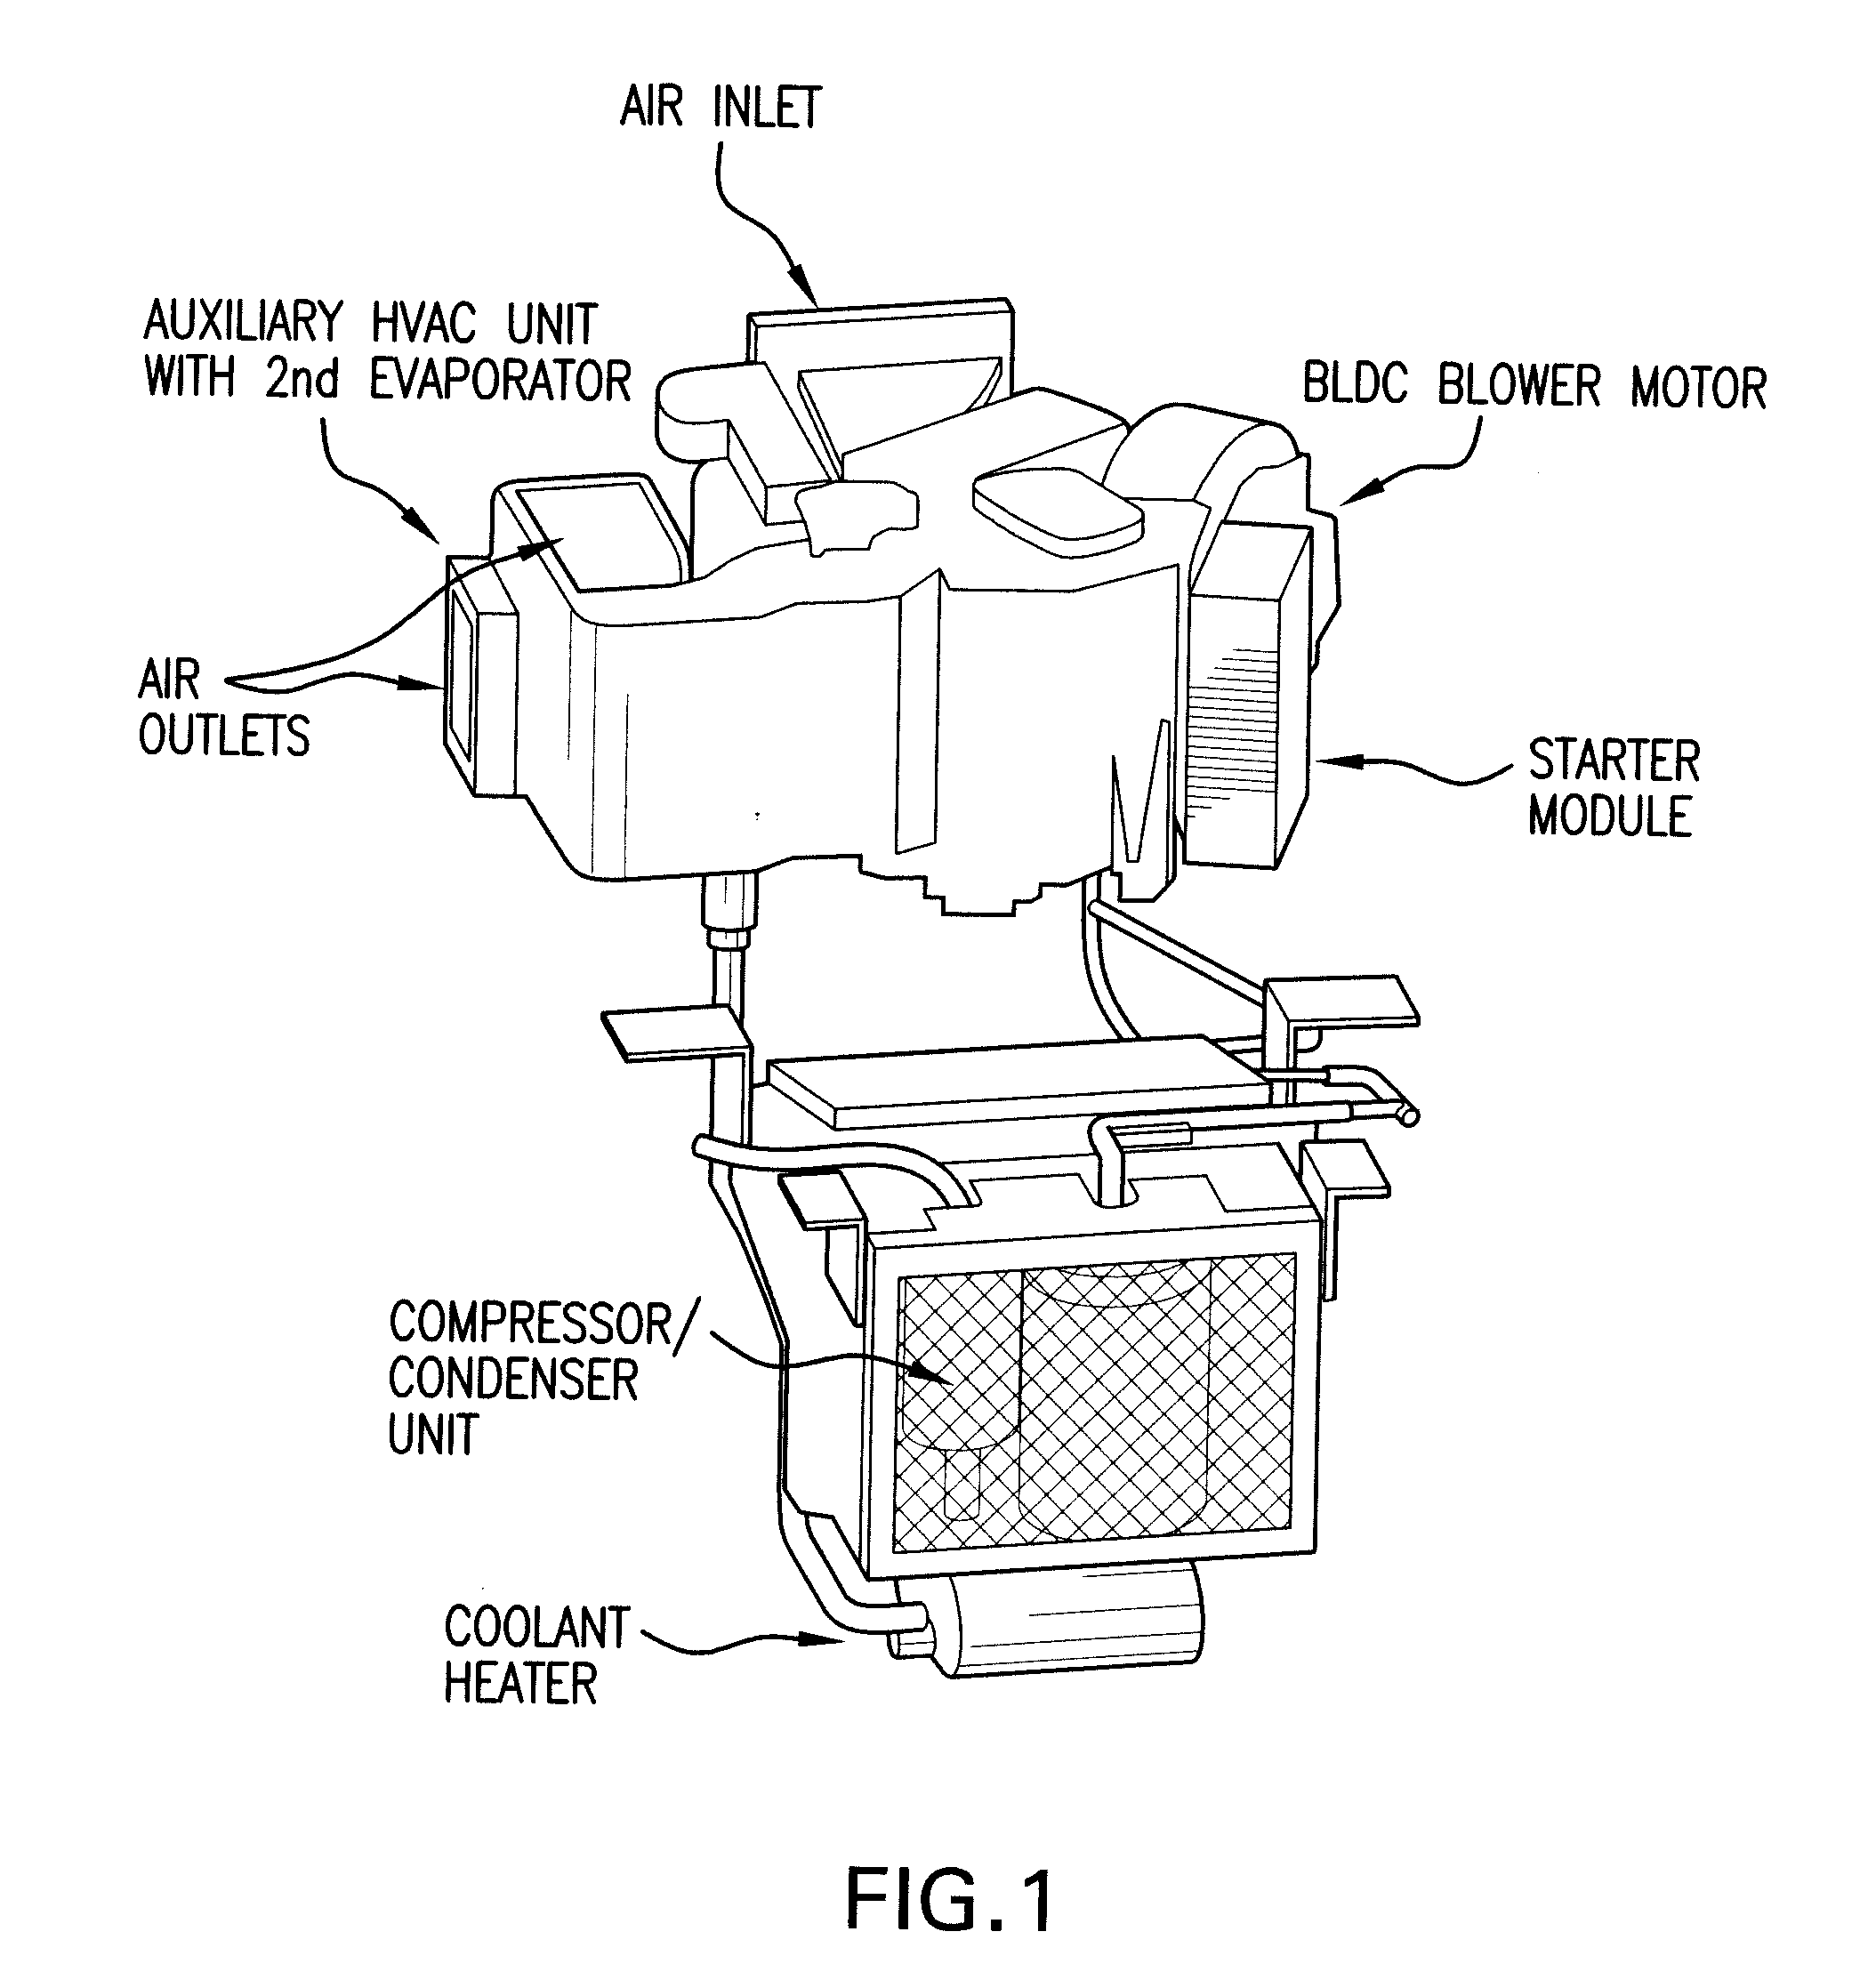 patent us20080134715 - vehicle hvac control system ... hvac controls drawing images #6